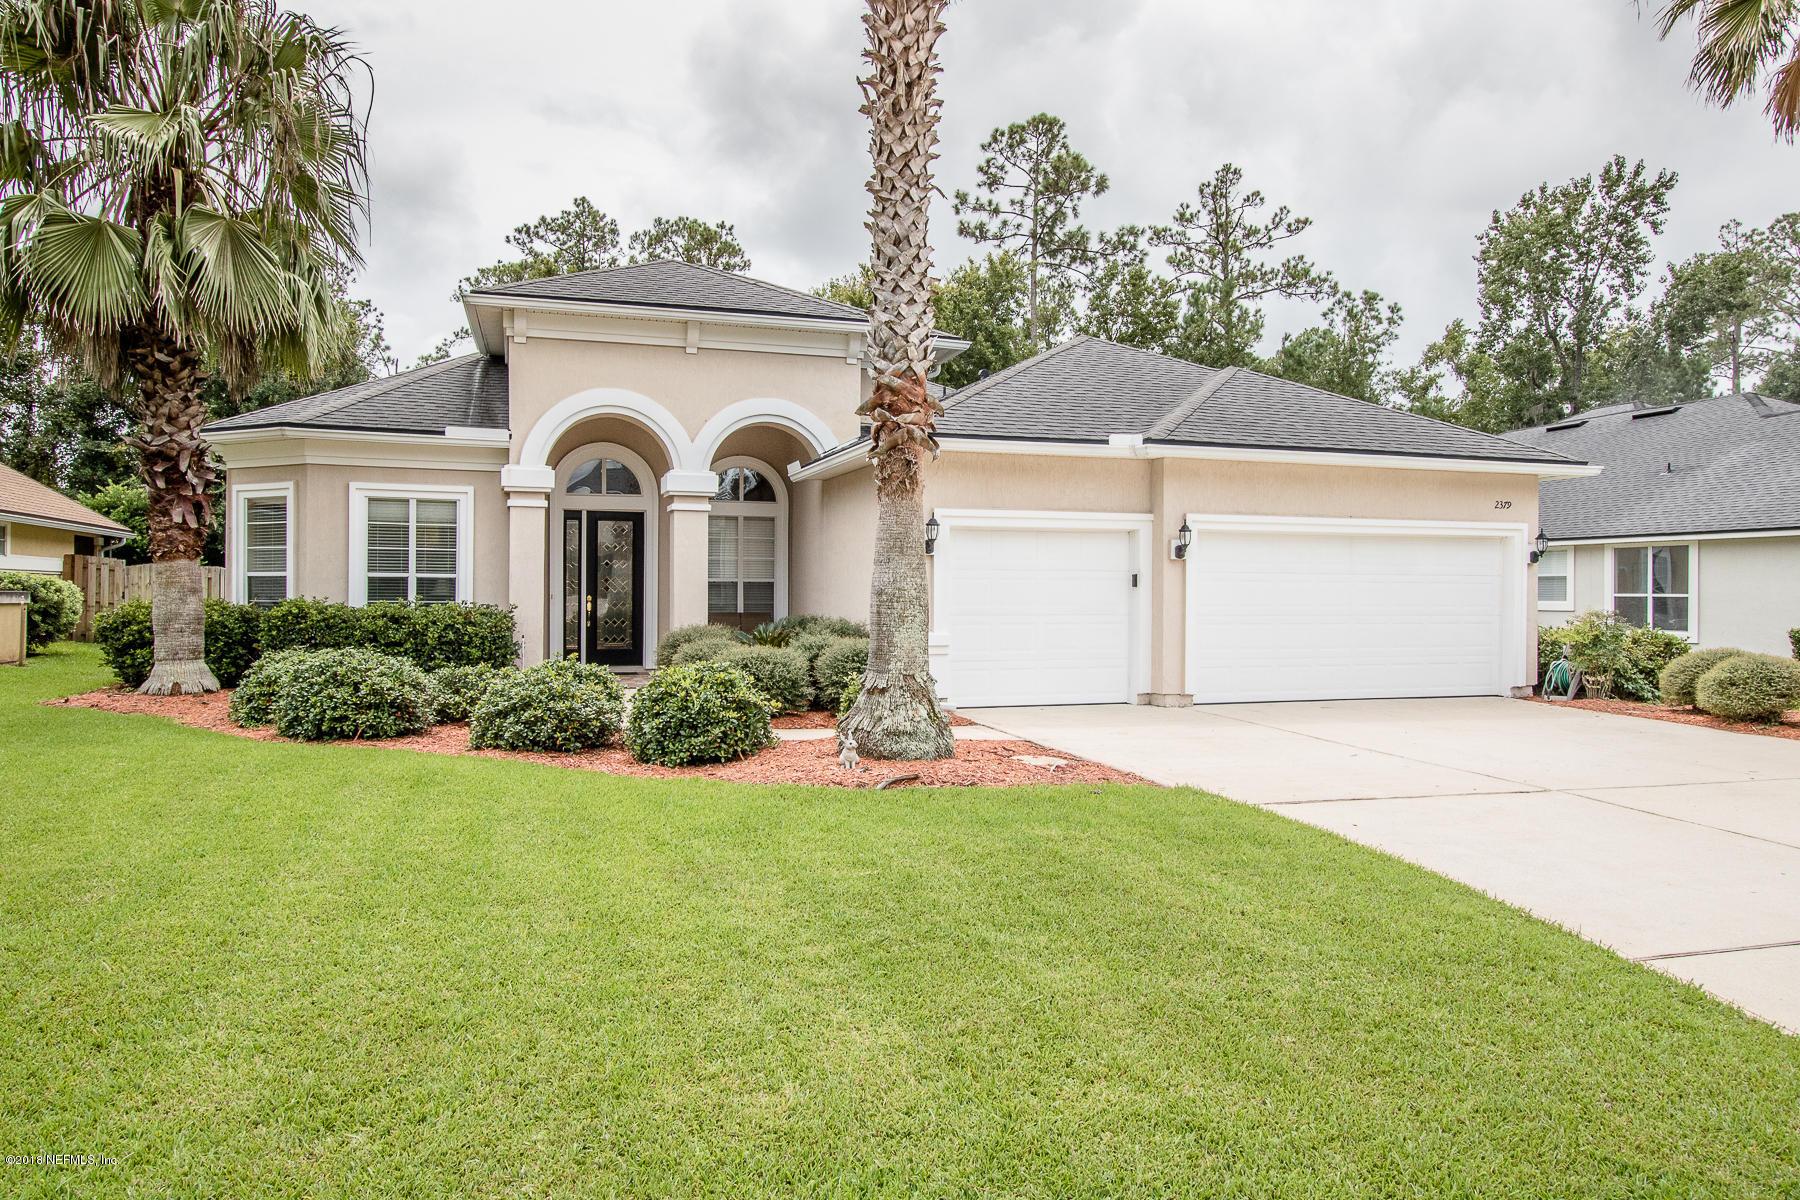 2379 STONEY GLEN, FLEMING ISLAND, FLORIDA 32003, 4 Bedrooms Bedrooms, ,3 BathroomsBathrooms,Residential - single family,For sale,STONEY GLEN,952724